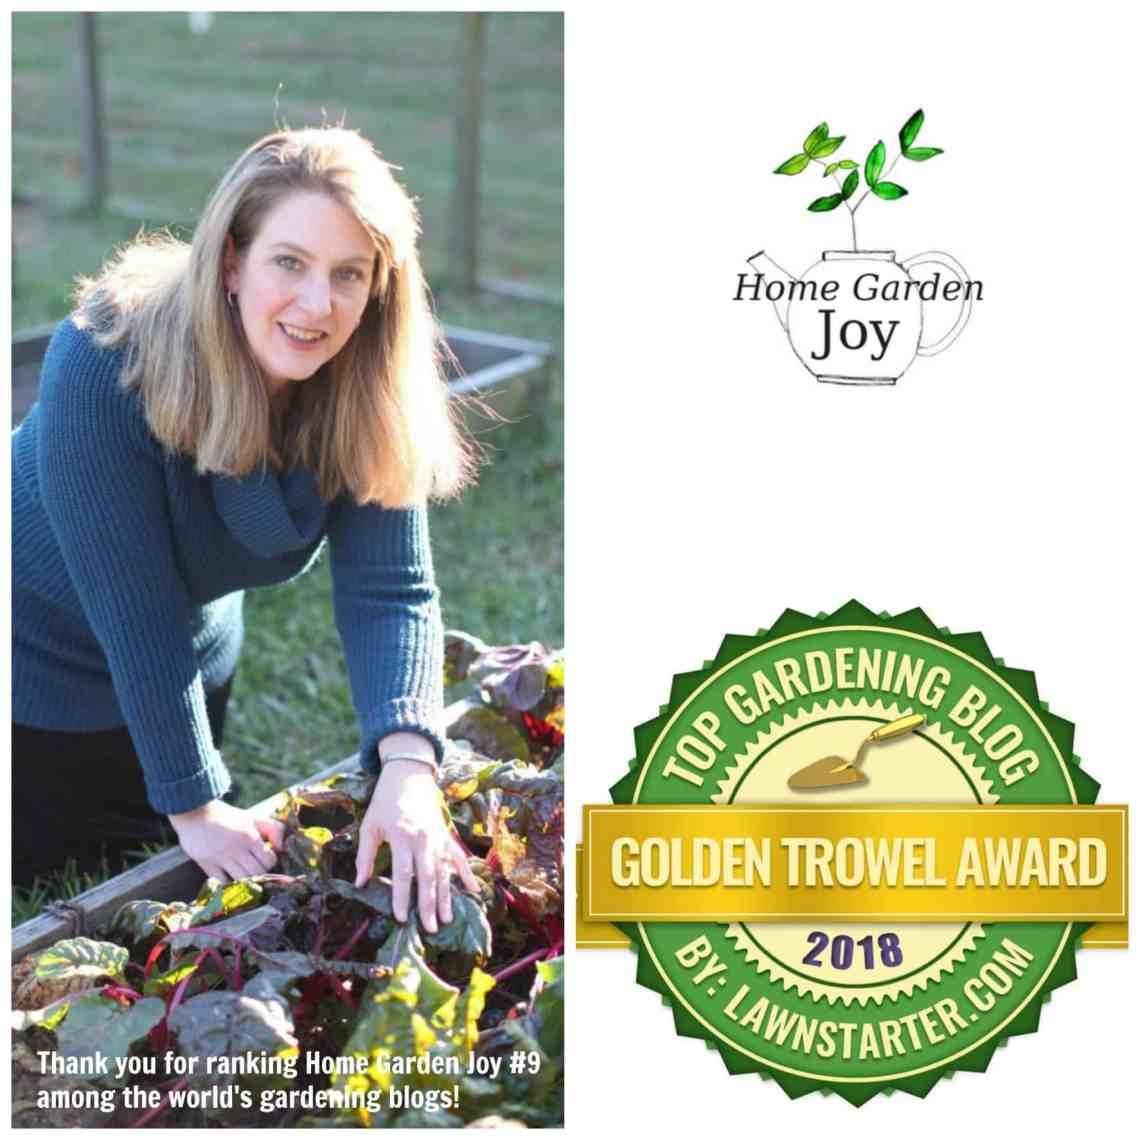 Home Garden Joy 2018 winner